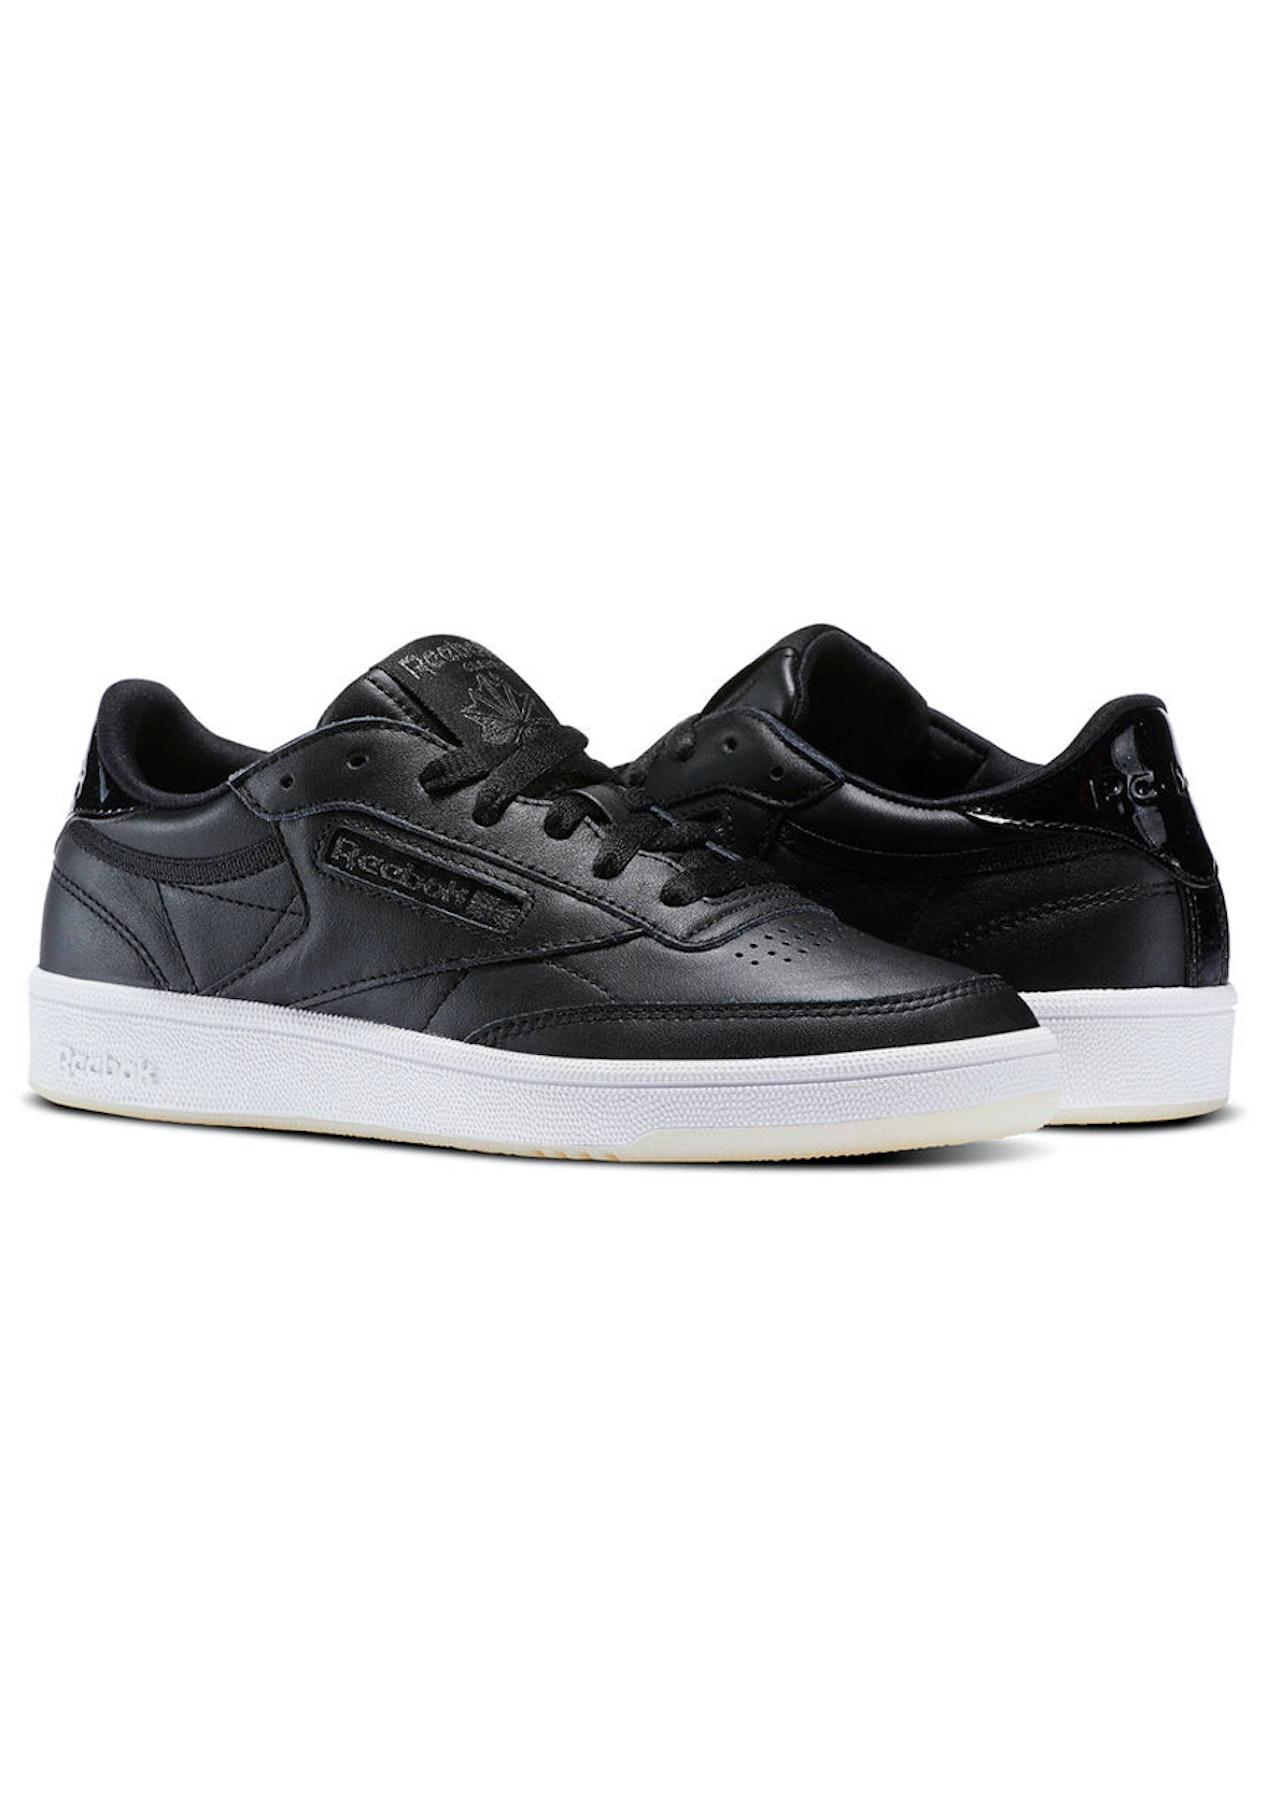 9436e7b43b8 Reebok Womens - Club C 85 Leather Black White Ice - Shoe Rummage Rack -  Onceit